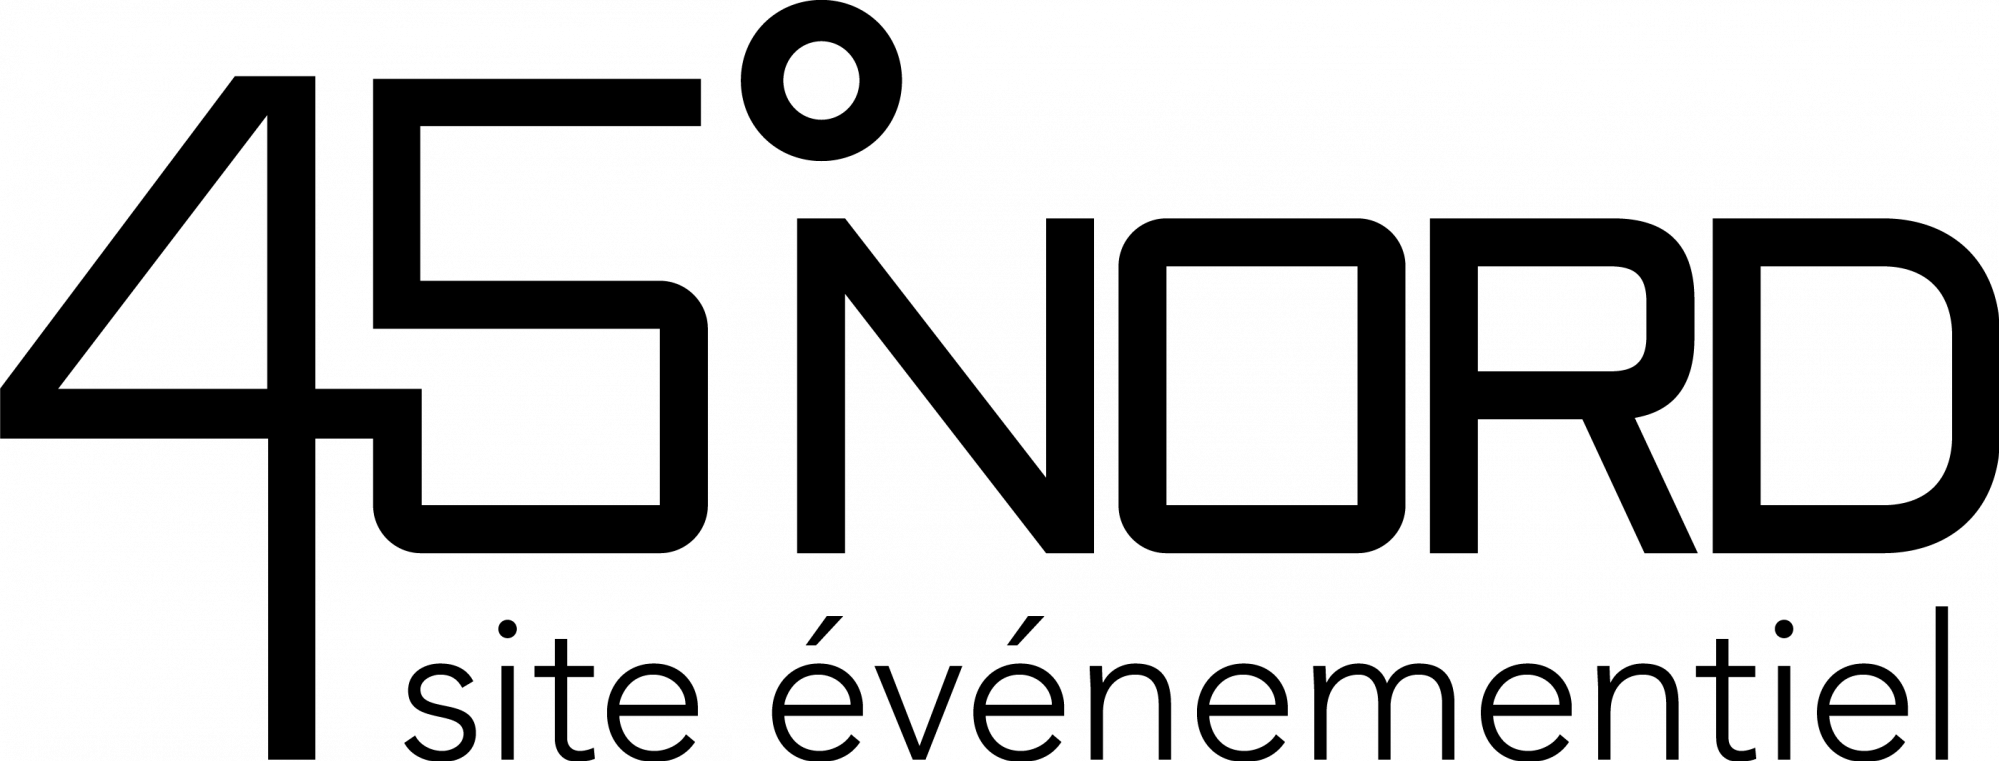 L 45 Nord NB